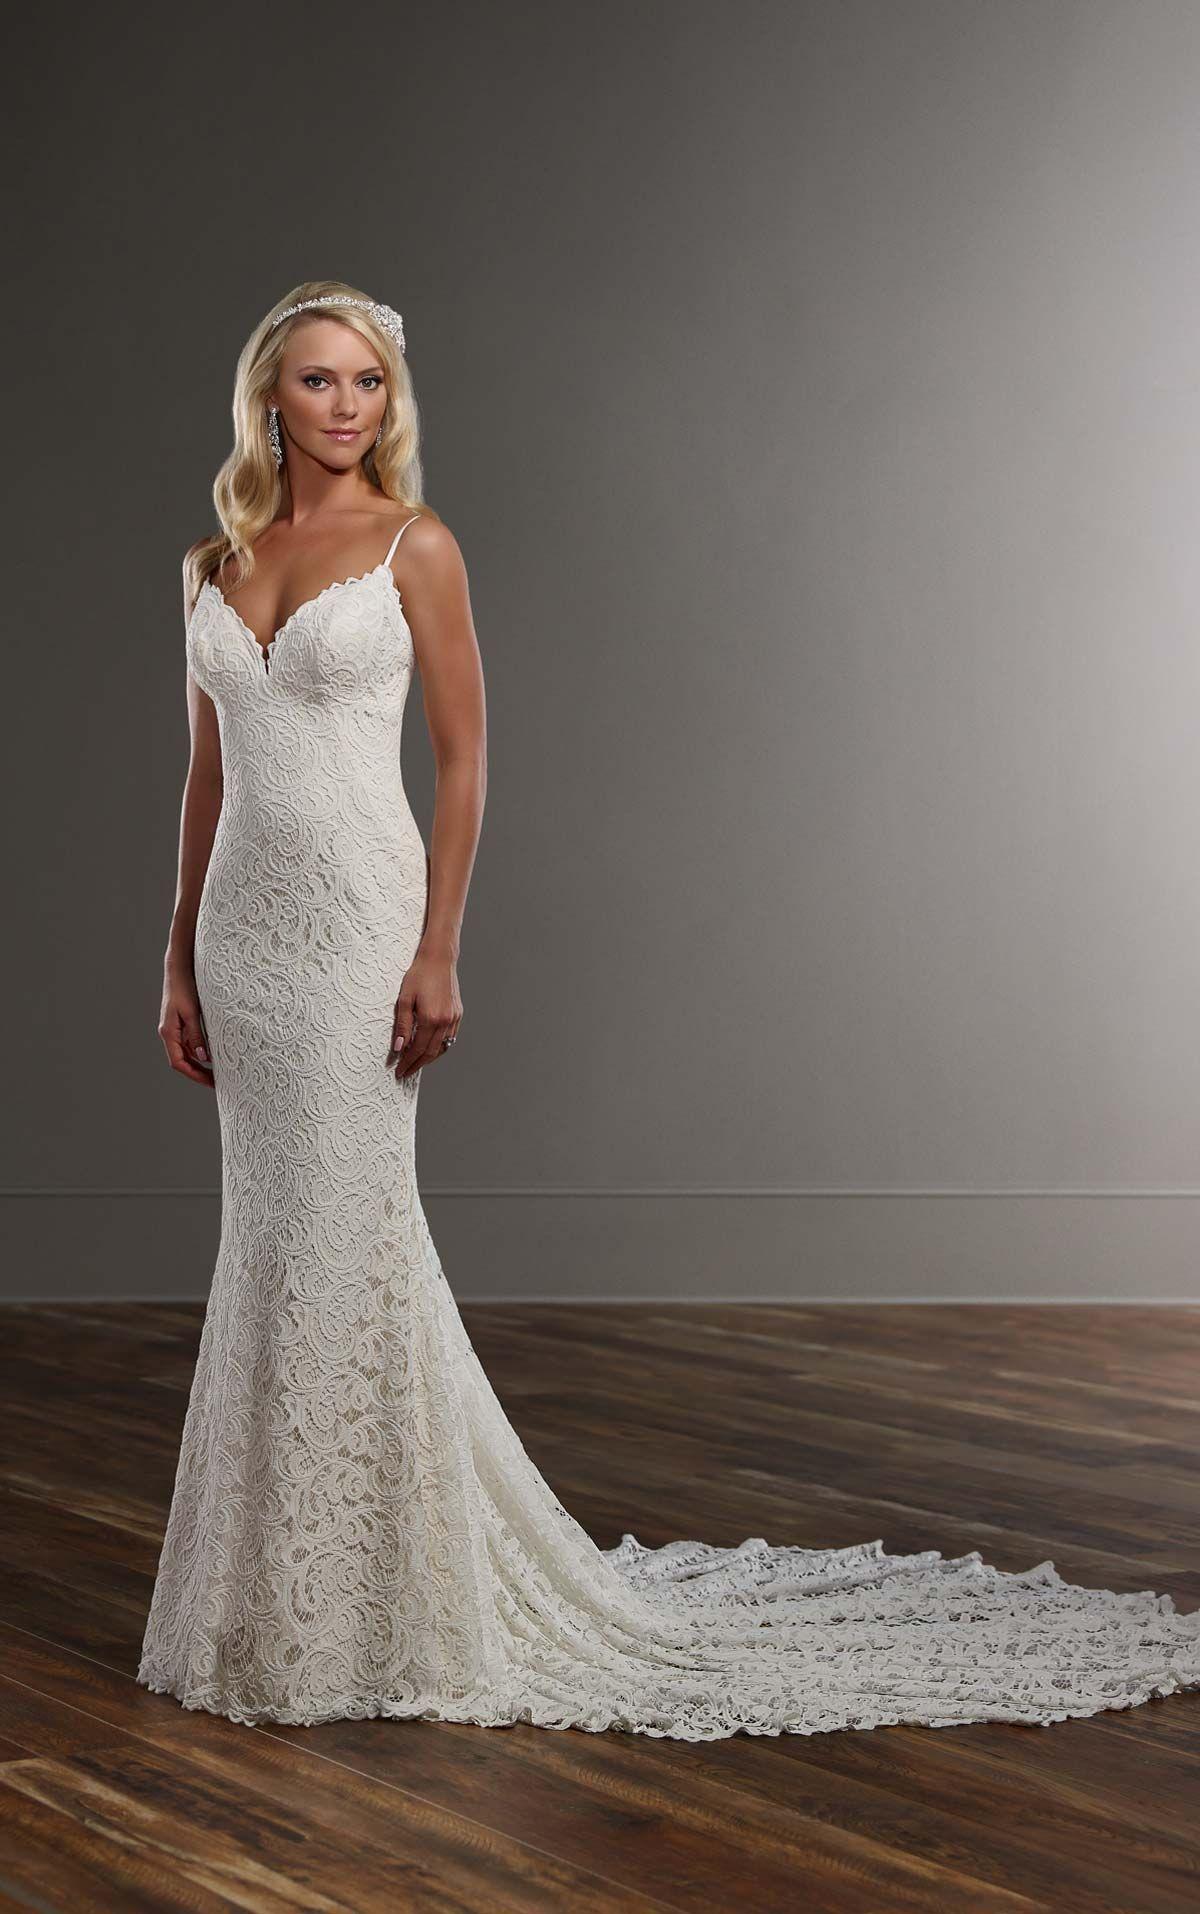 Graphic lace wedding dress with straps sleek wedding